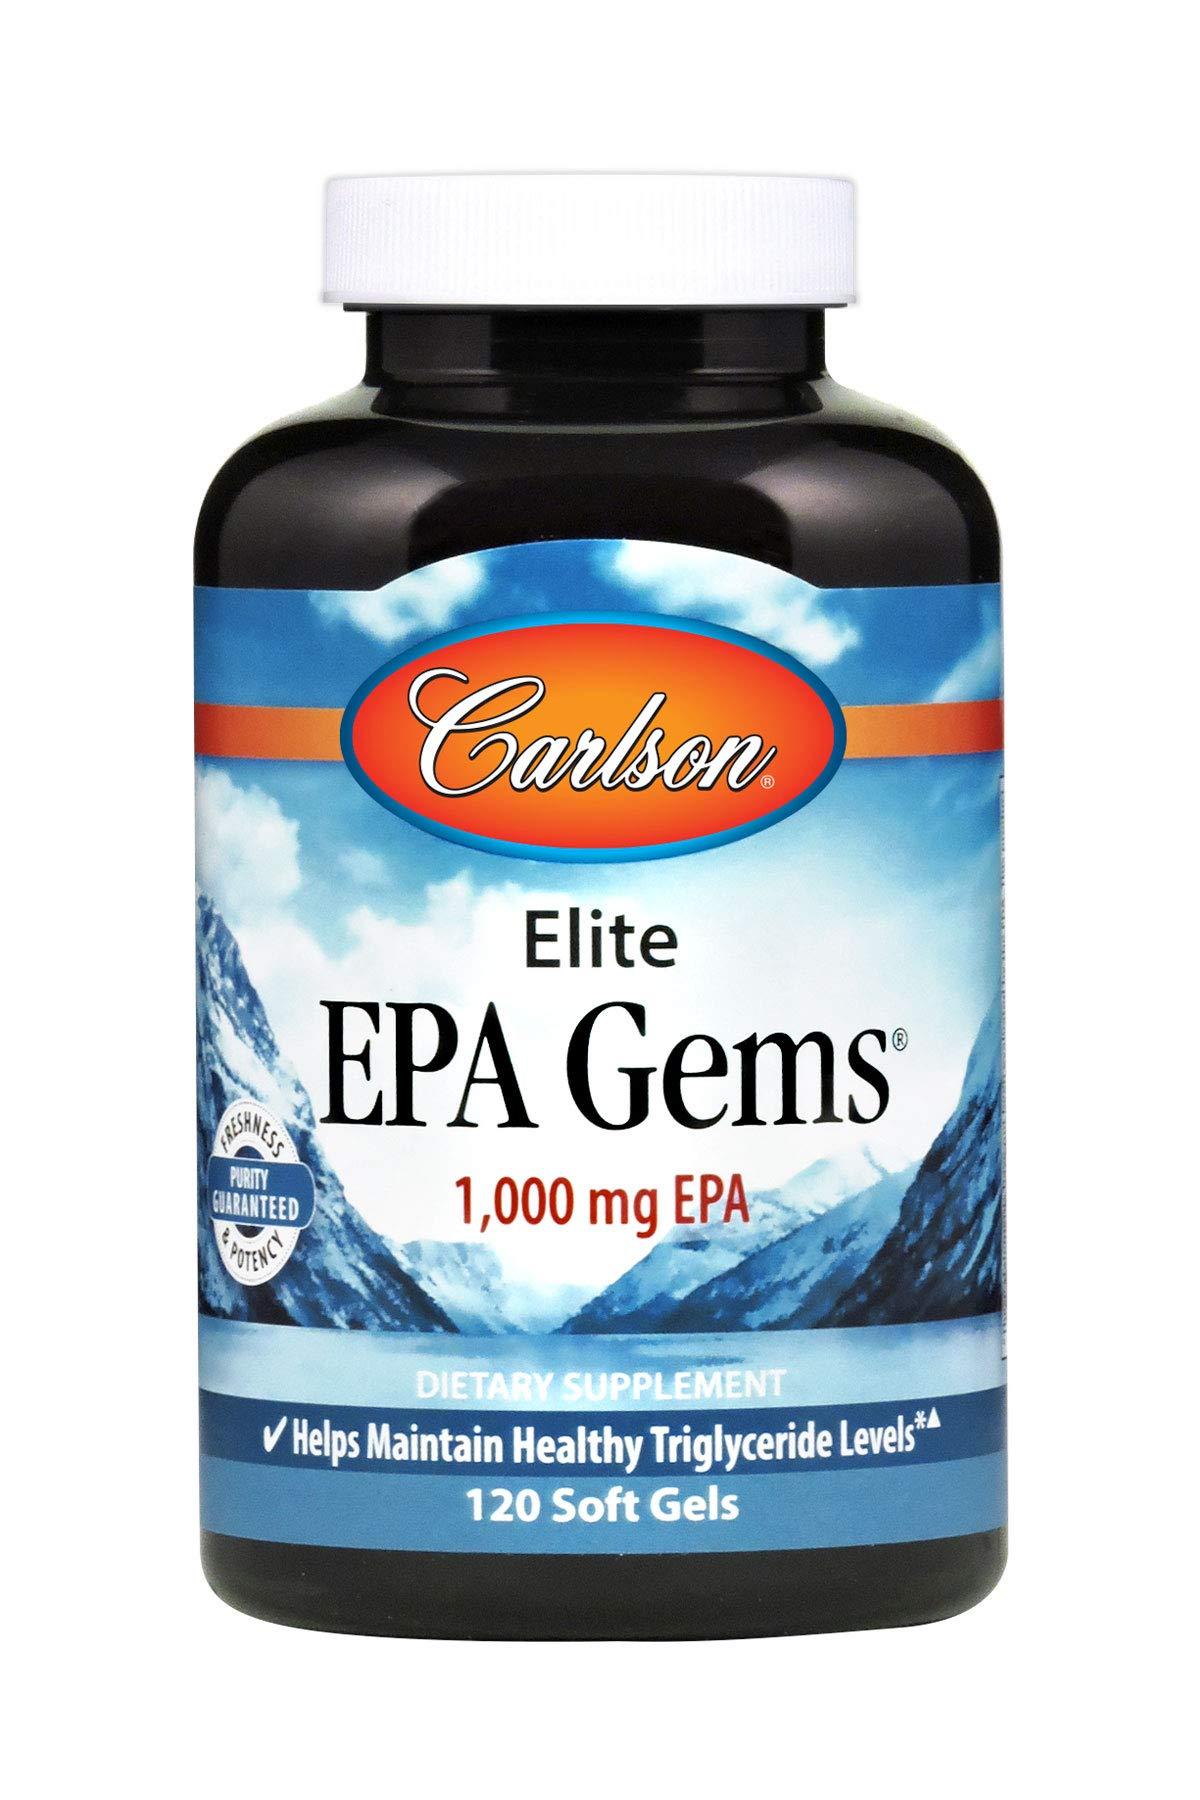 Carlson Elite EPA Gems, 1,000 mg EPA, 120 Soft Gels